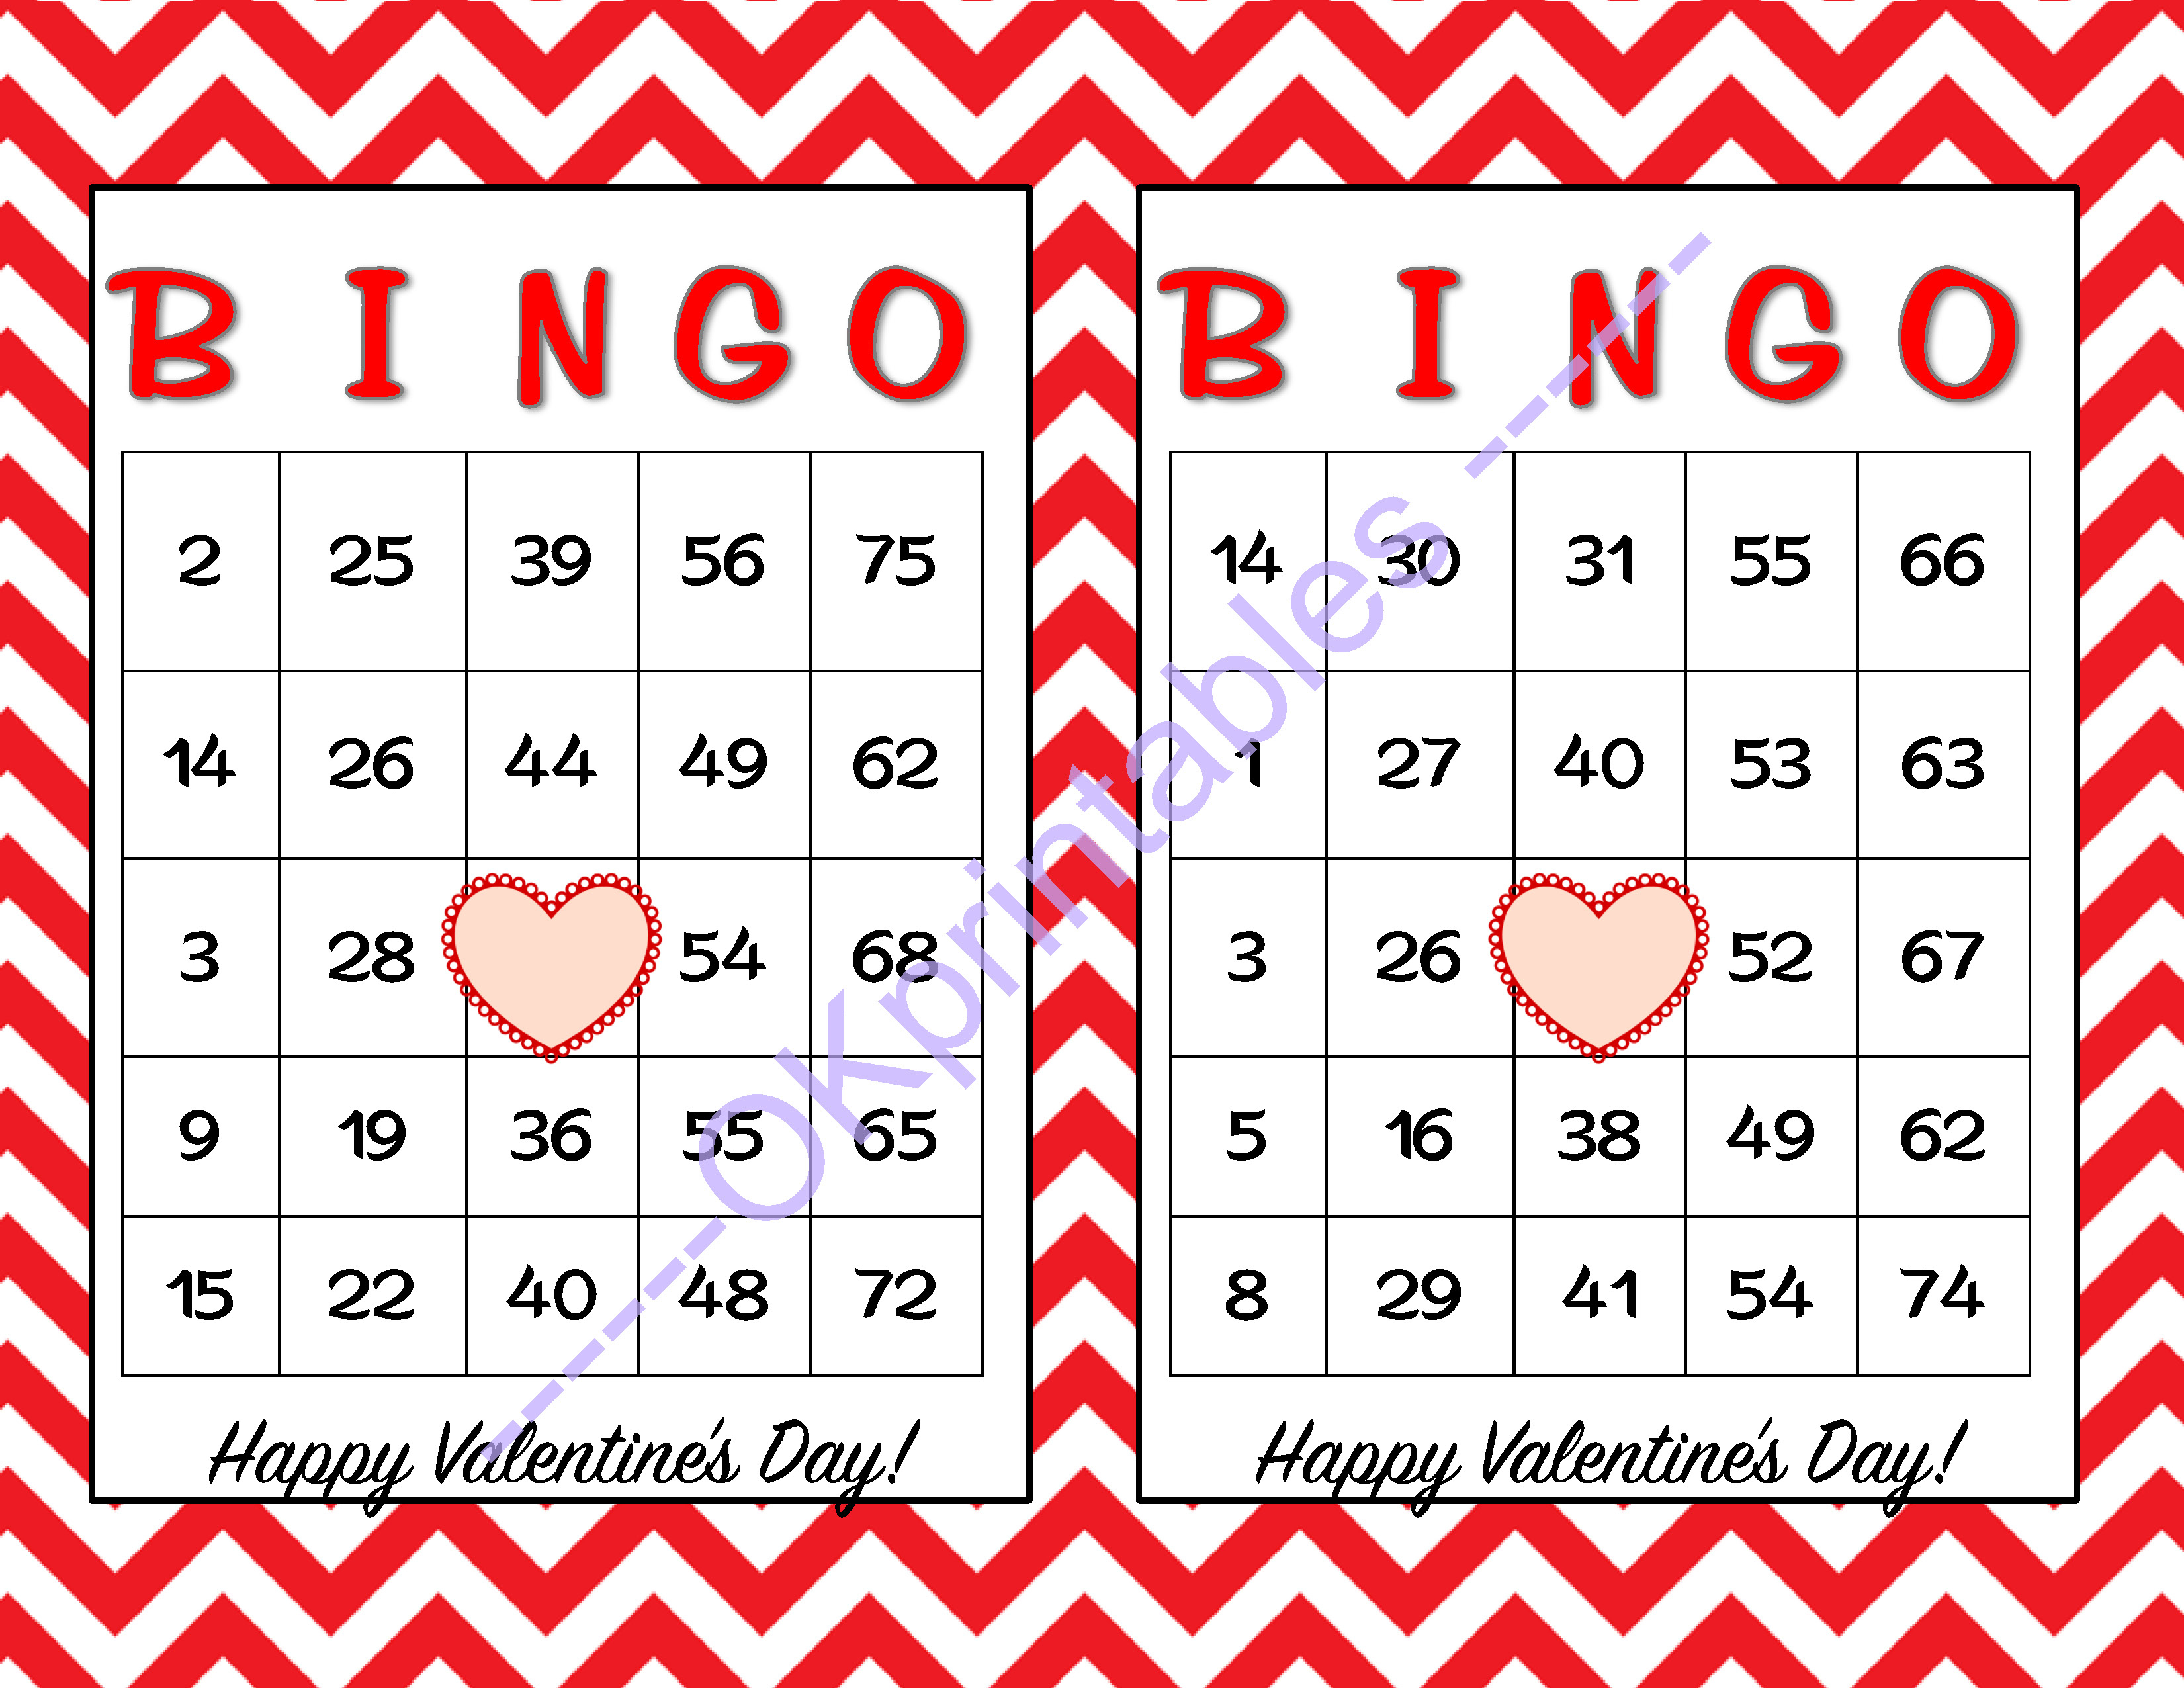 30 Happy Valentines Day Bingo Cards -Okprintables On Zibbet - Free Printable Bingo Cards Random Numbers